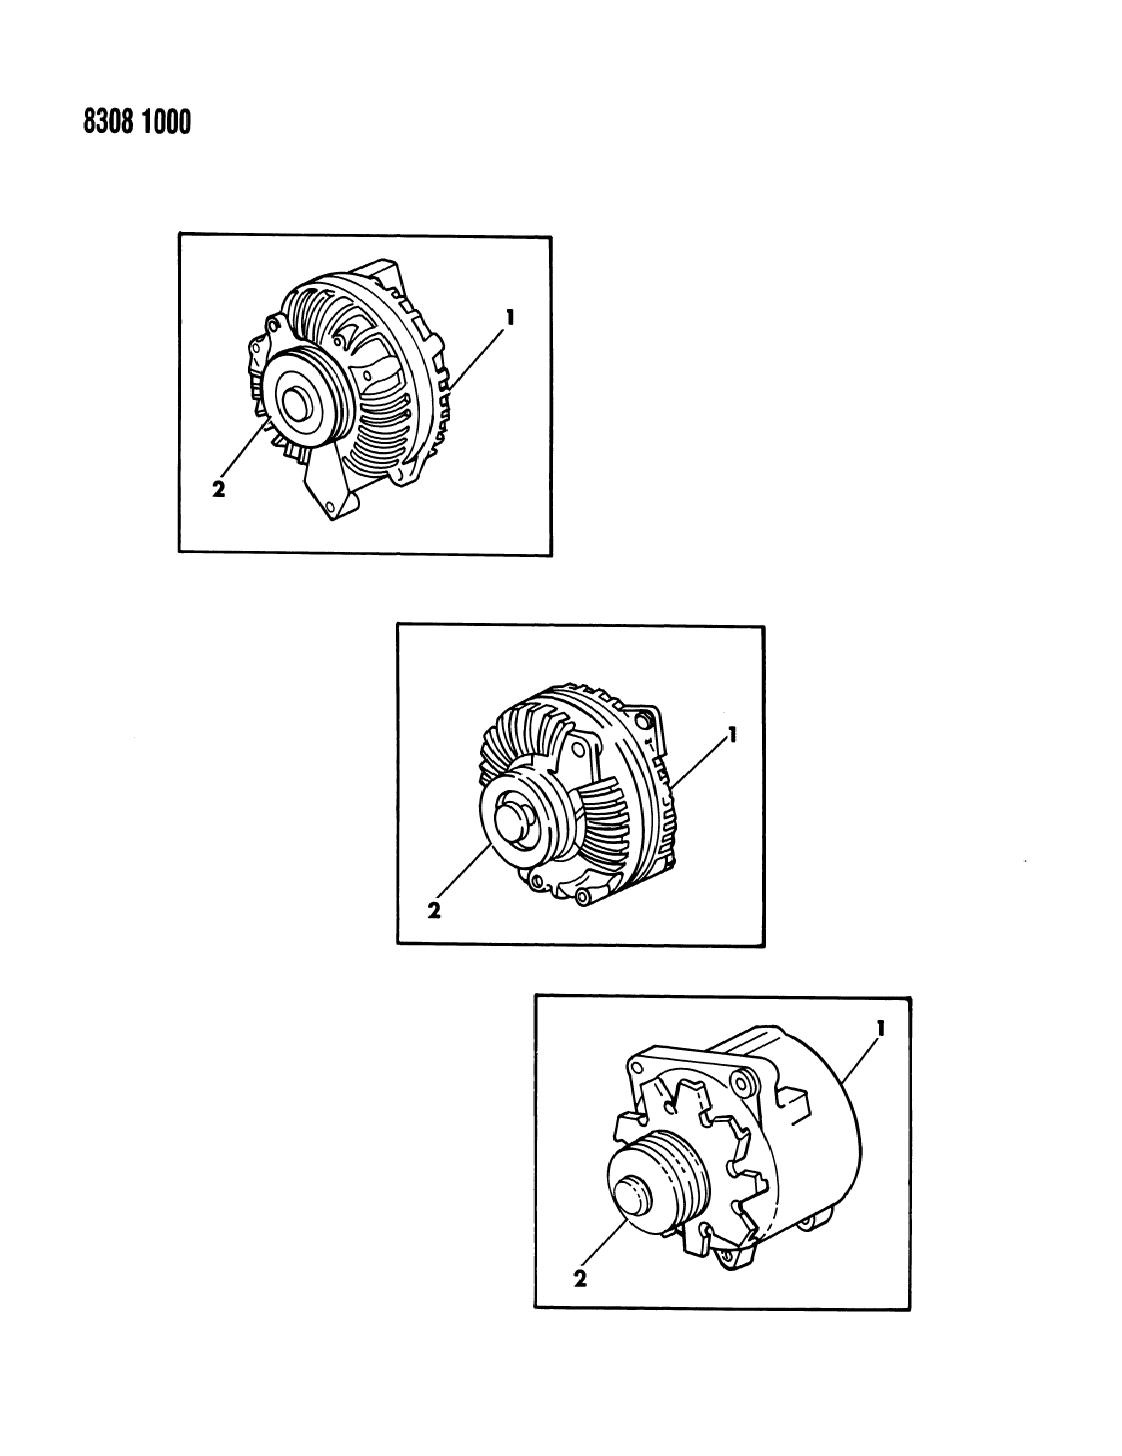 1988 dodge dakota alternator & pulley